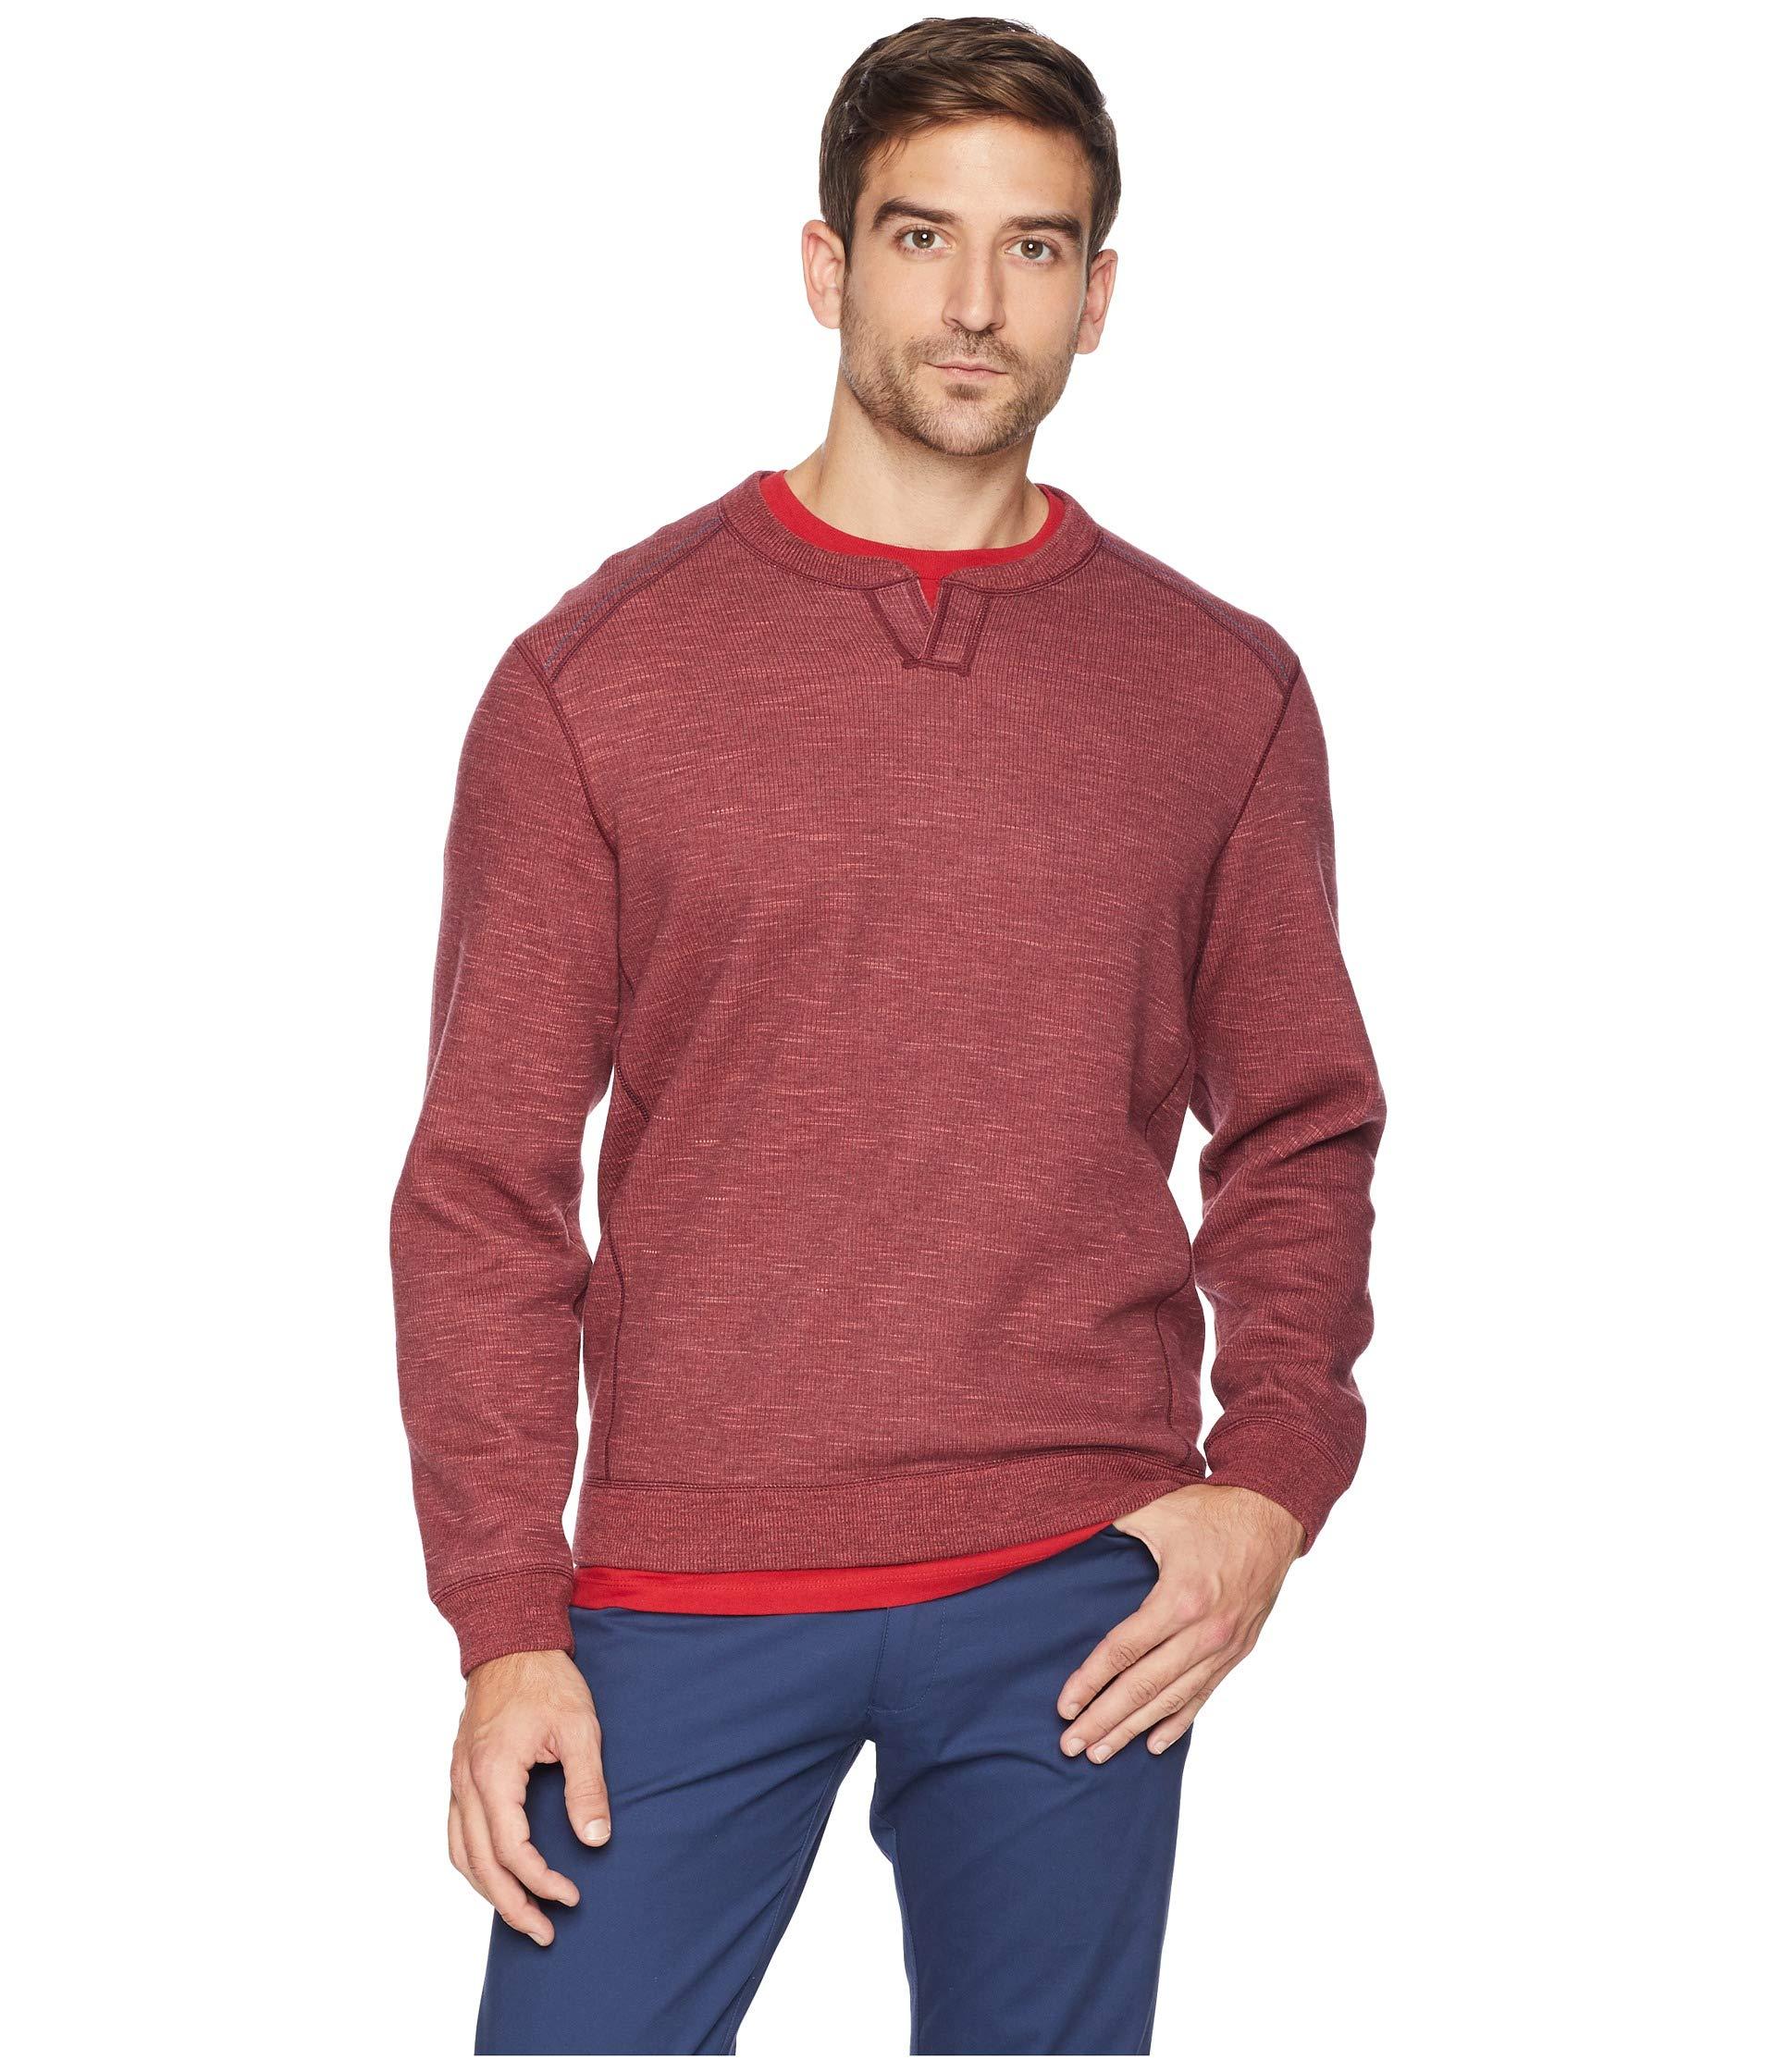 Plum Abaco Heather Raisin Bahama Tommy Flipsider Reversible Sweater qPwR7RxpT